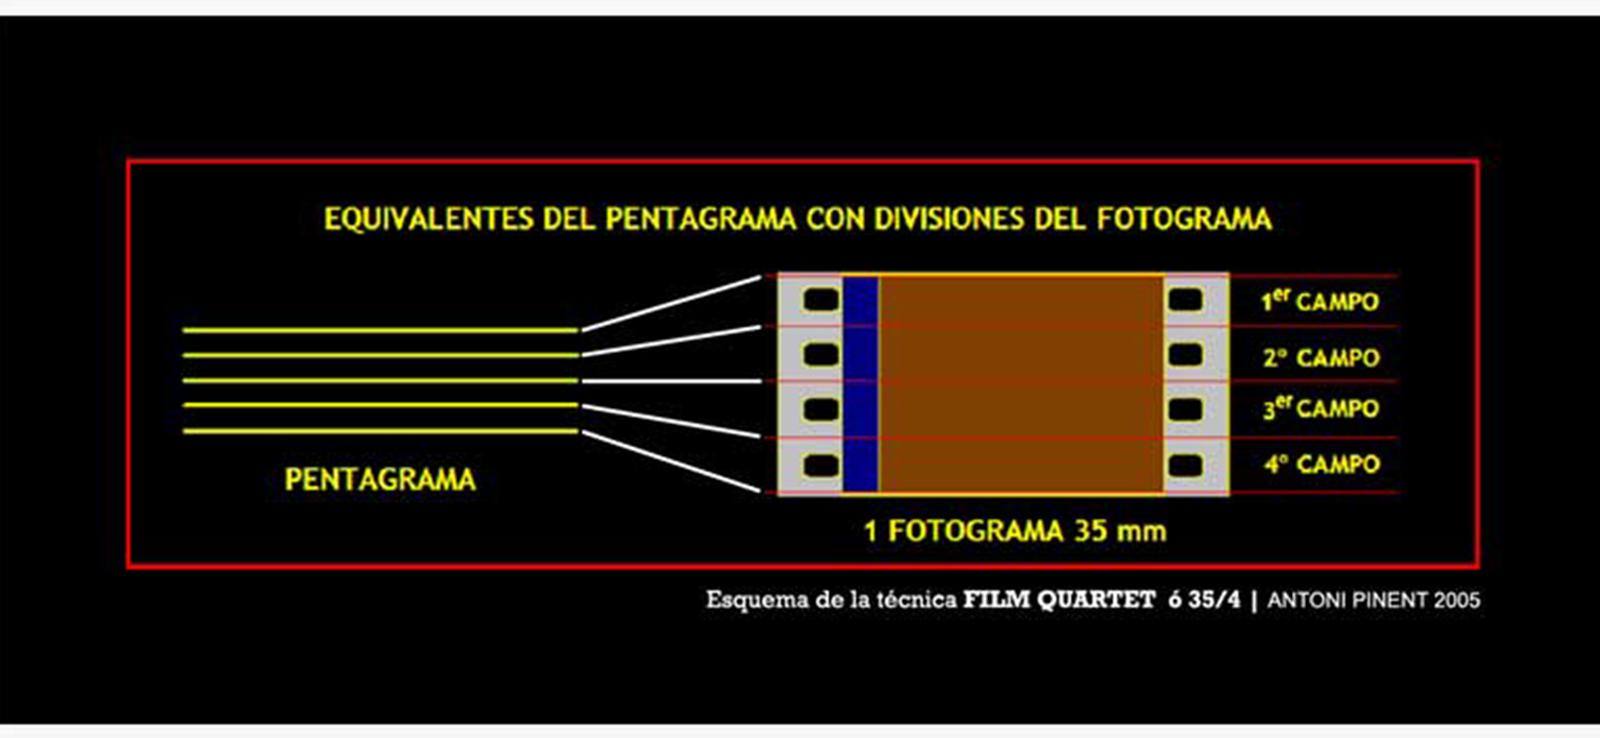 Antoni-Pinent-FILM-QUARTET-POLYFRAME-experimental-found-fotage-film